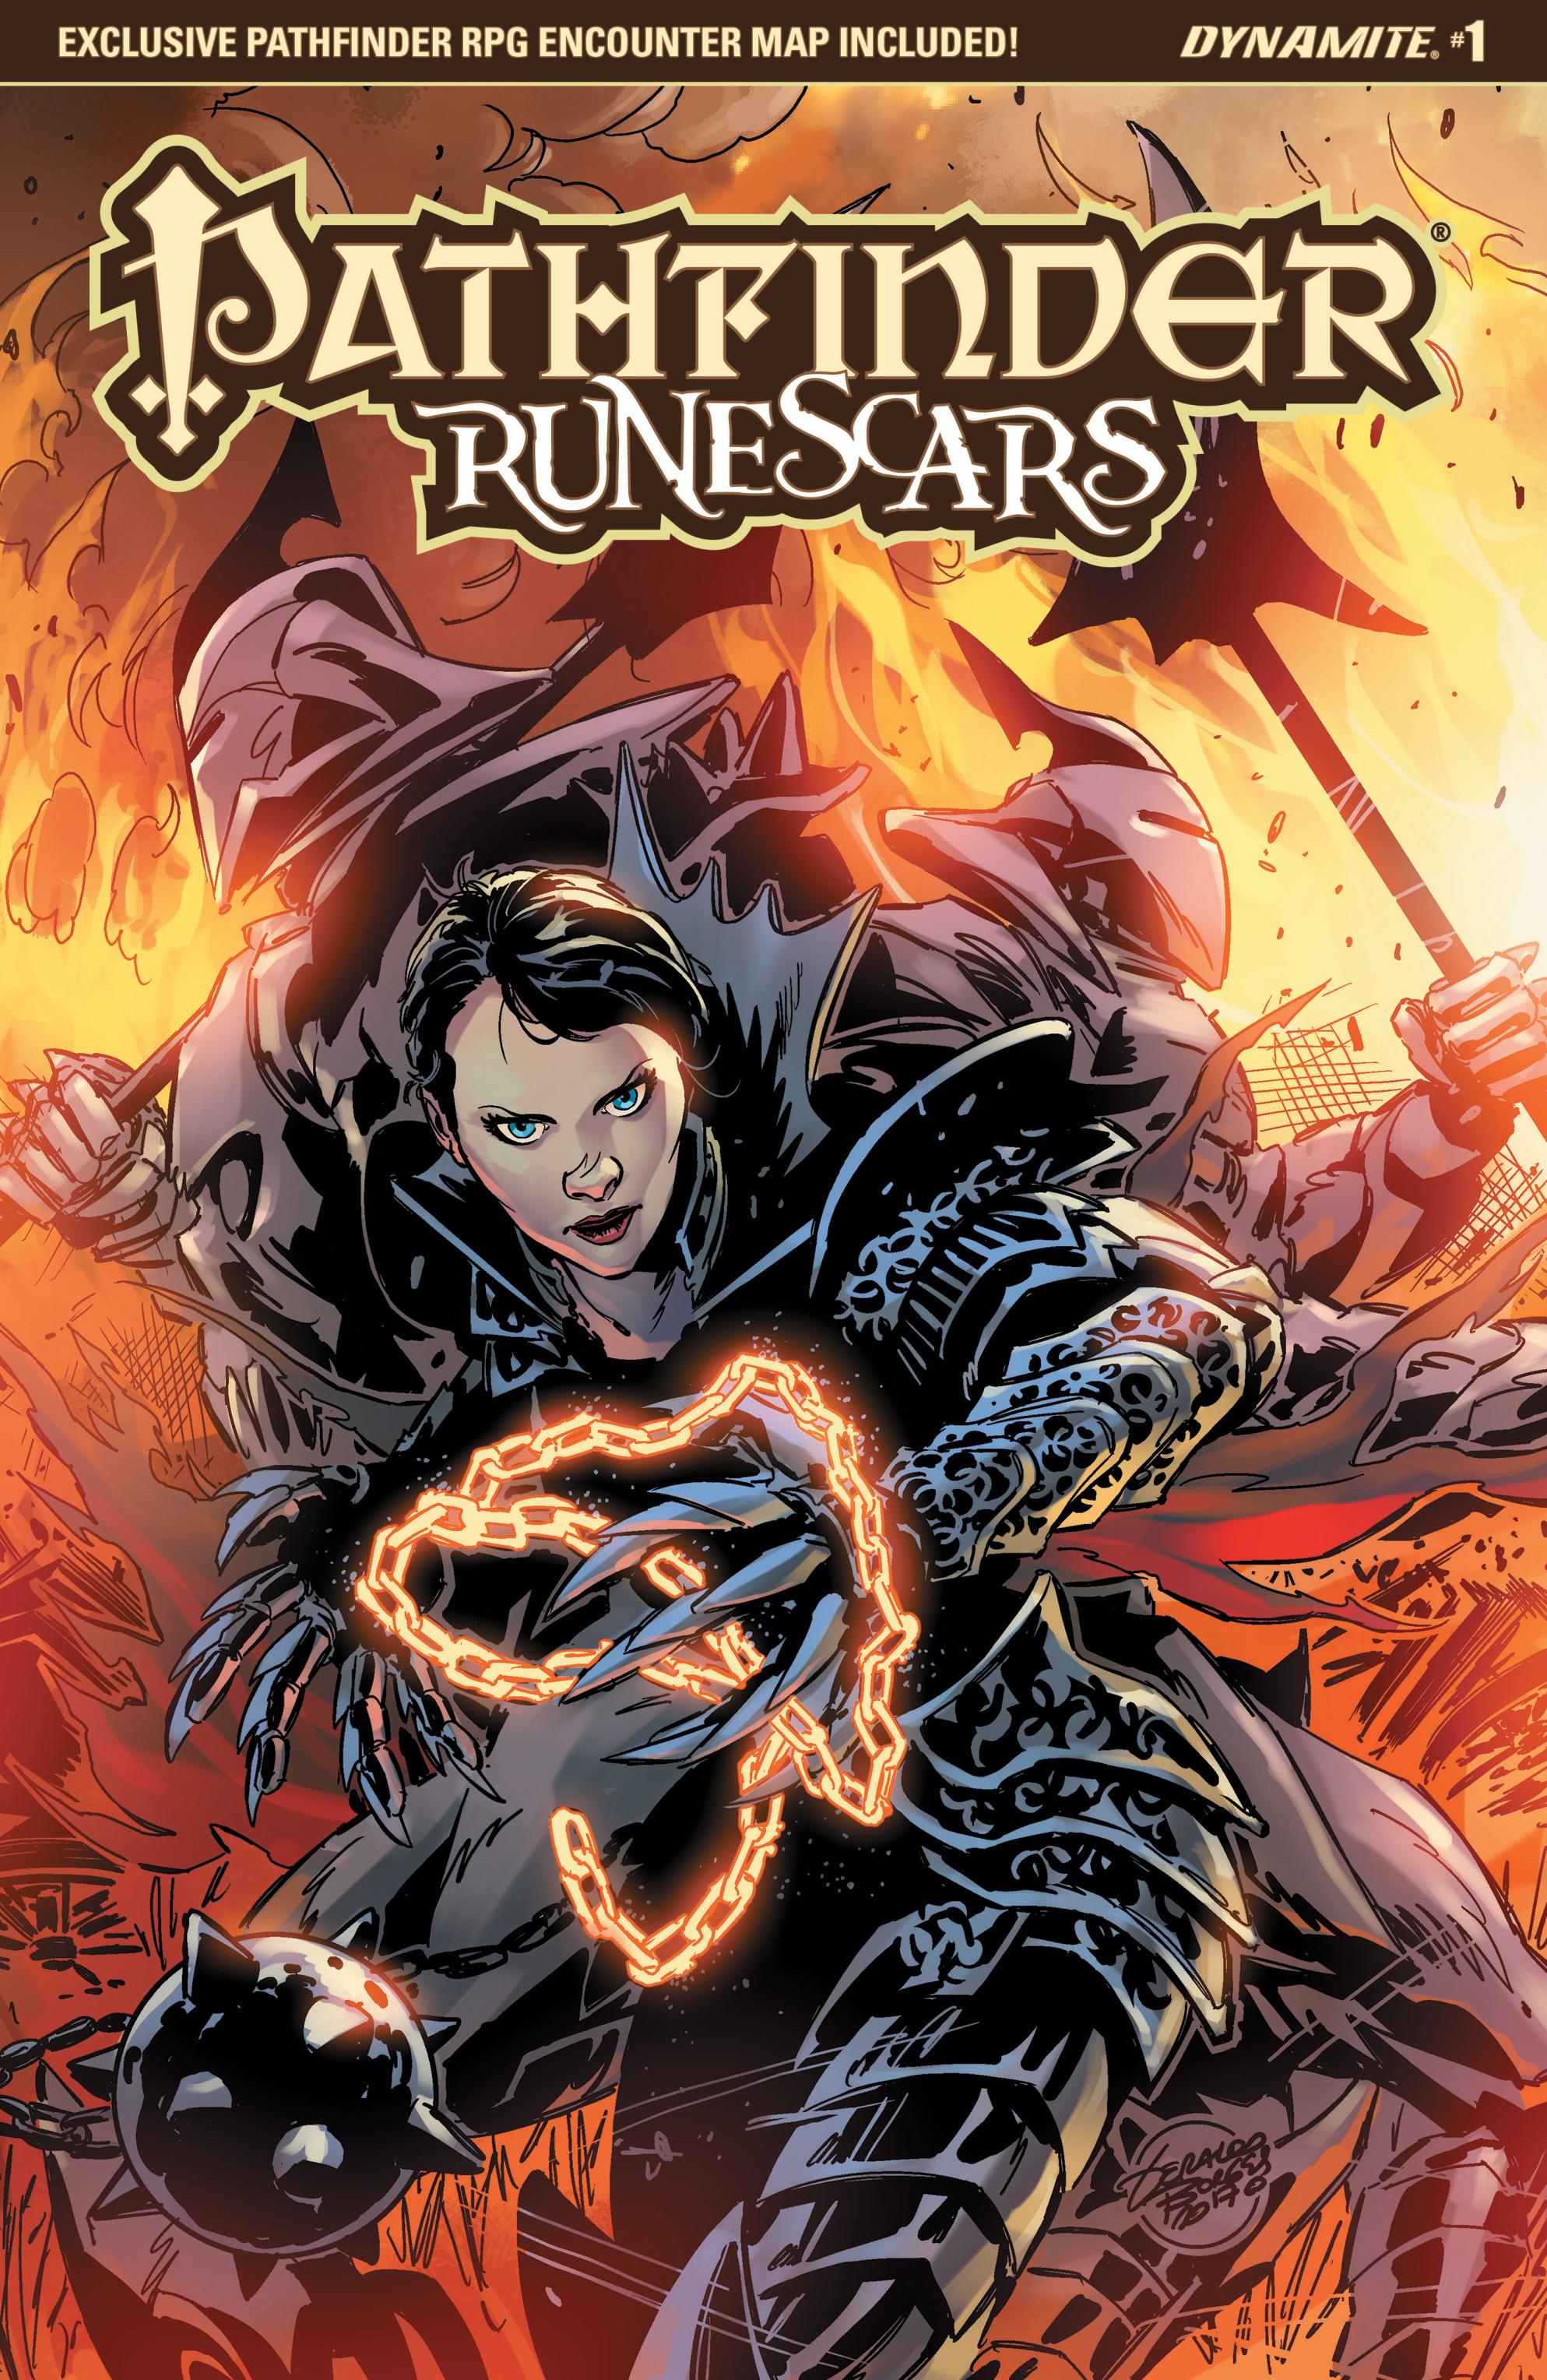 Read online Pathfinder: Runescars comic -  Issue #1 - 2